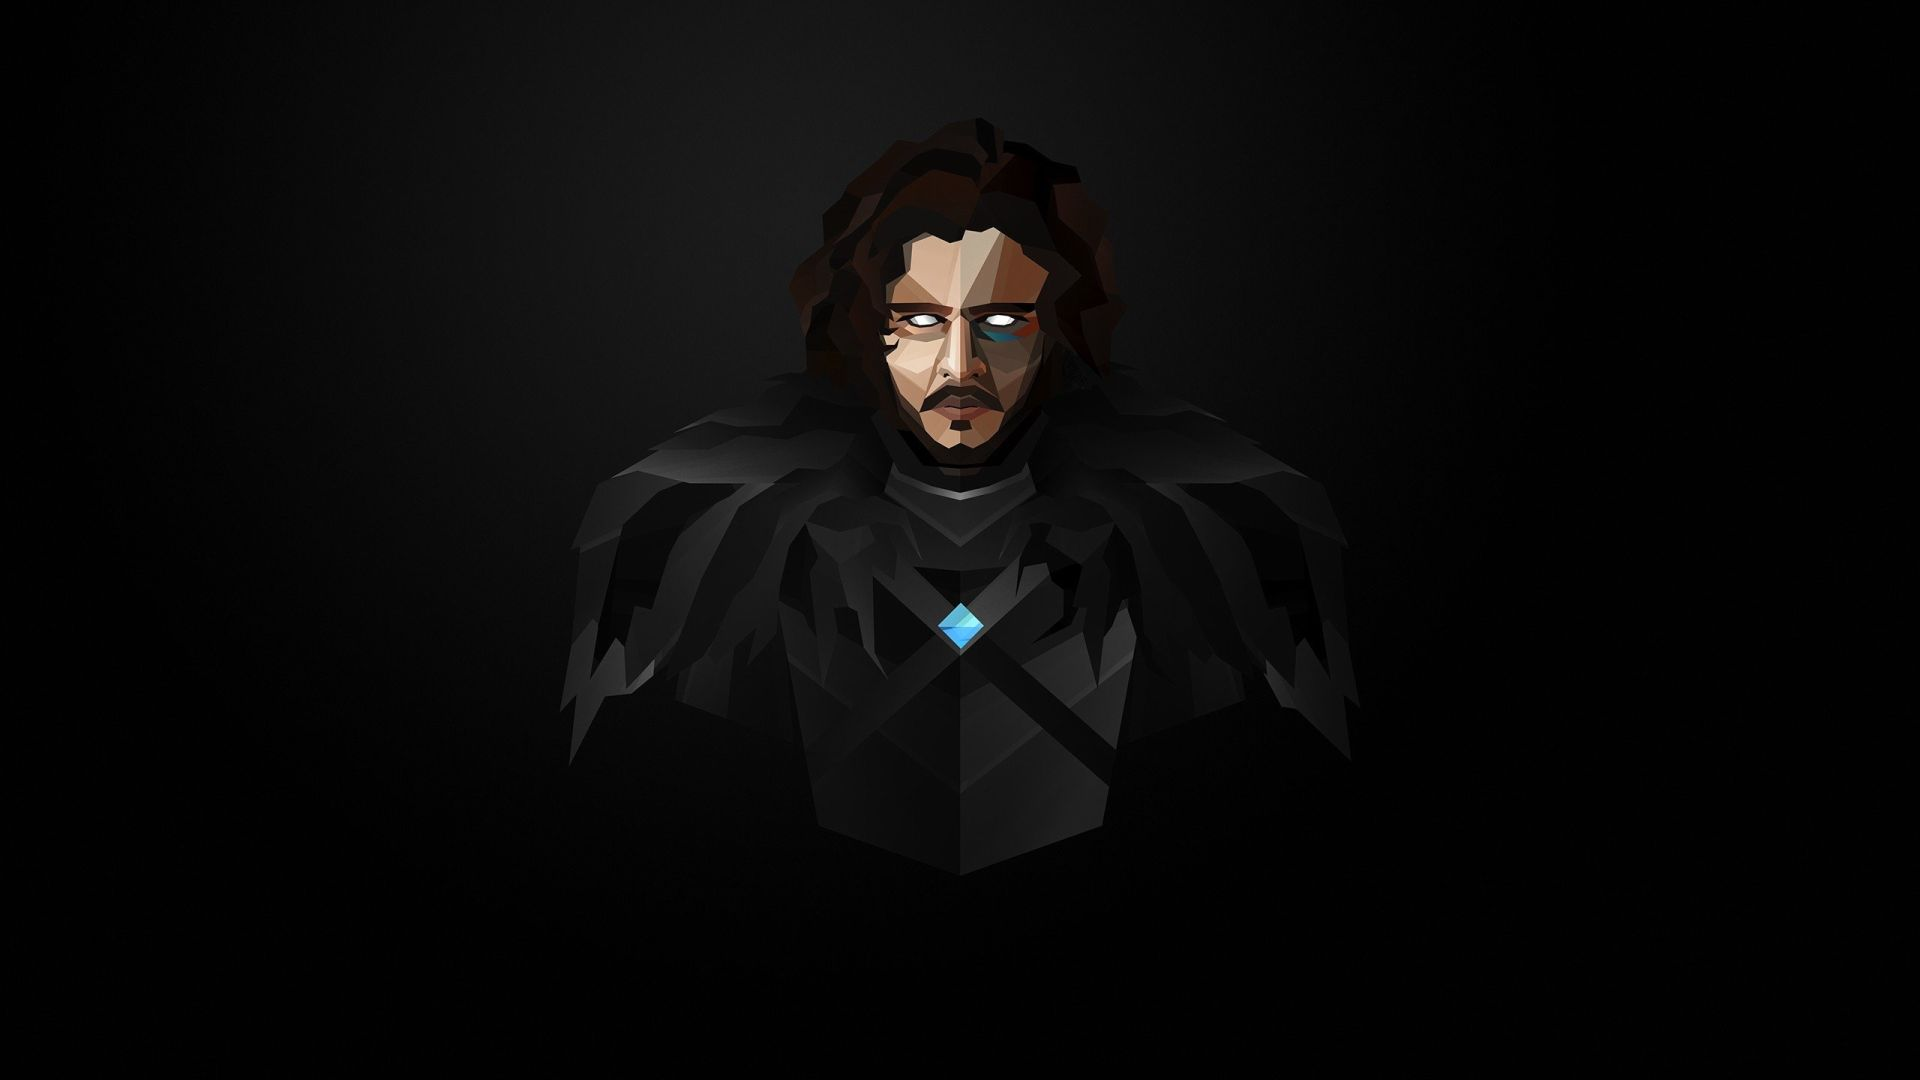 Jon Snow Game of Thrones illustration vector